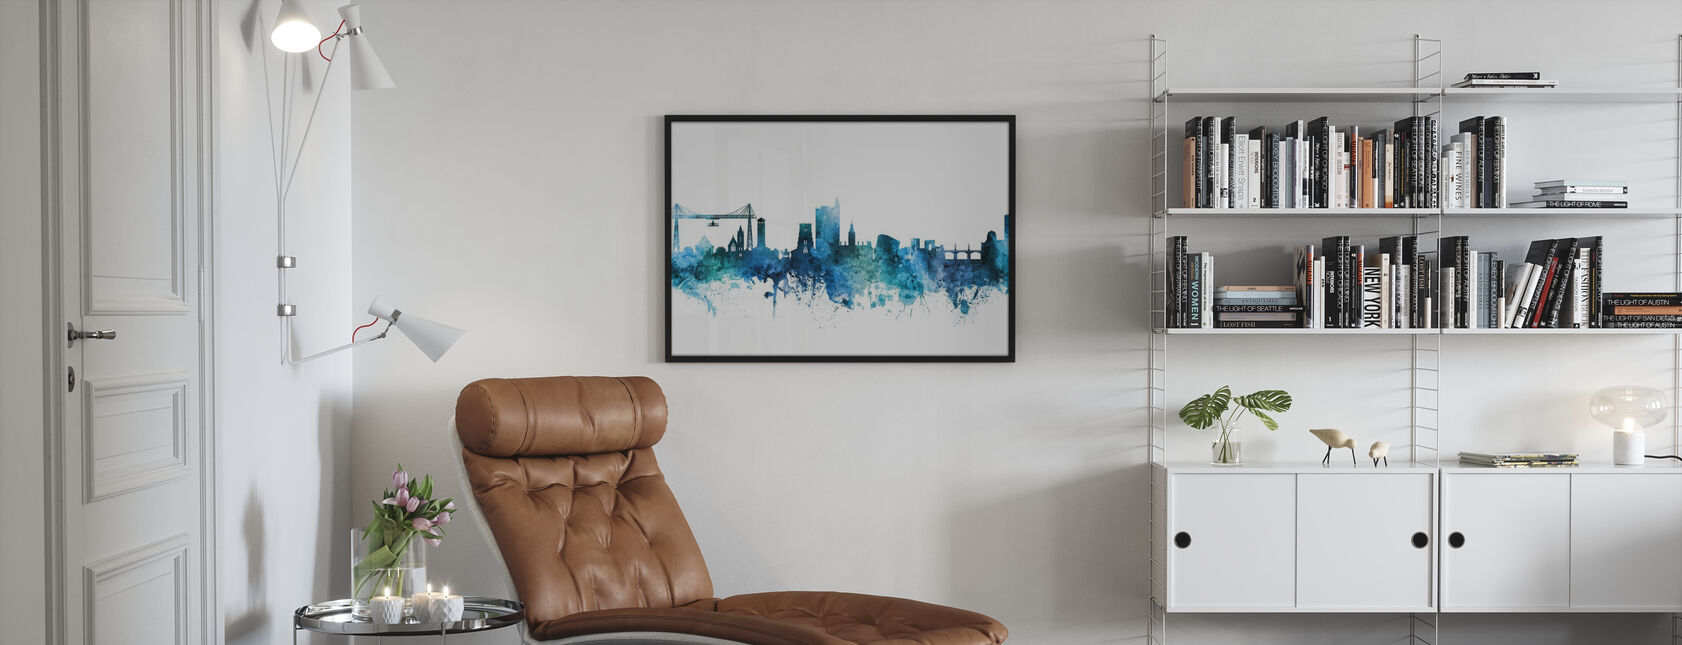 Newport Wales Skyline - Framed print - Living Room